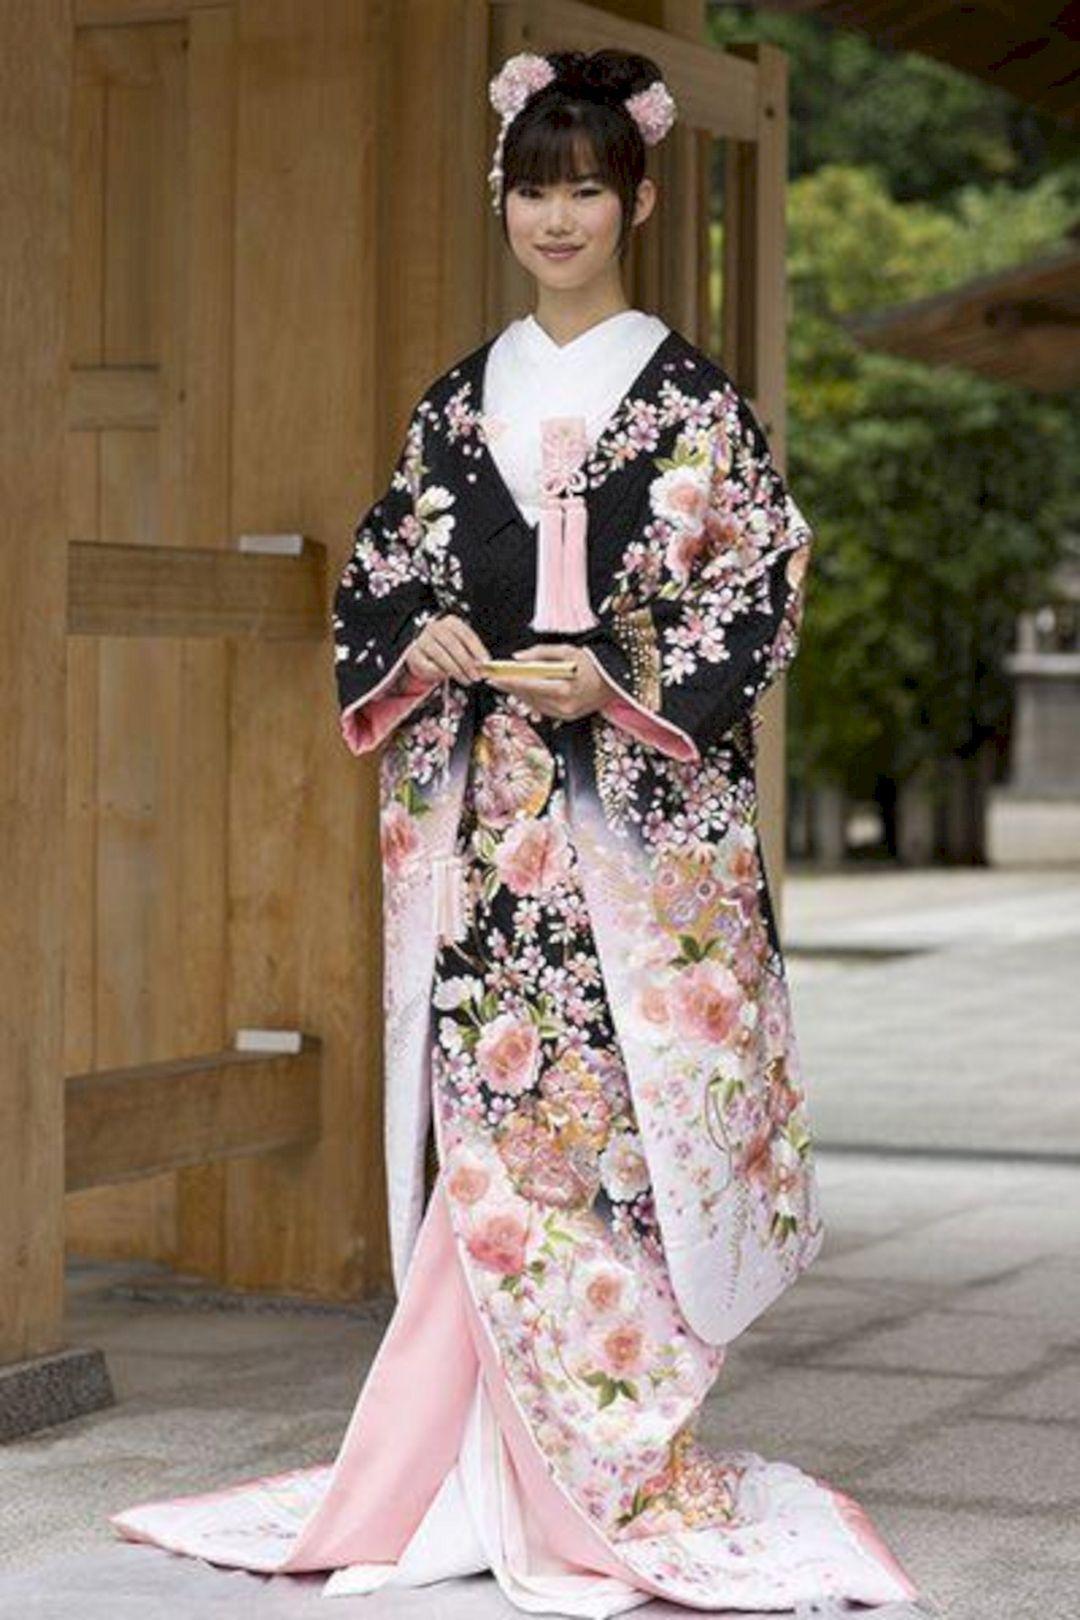 25 Beautiful Japanese Wedding Dress Design Ideas Japanese Wedding Dress Japanese Fashion Japanese Outfits